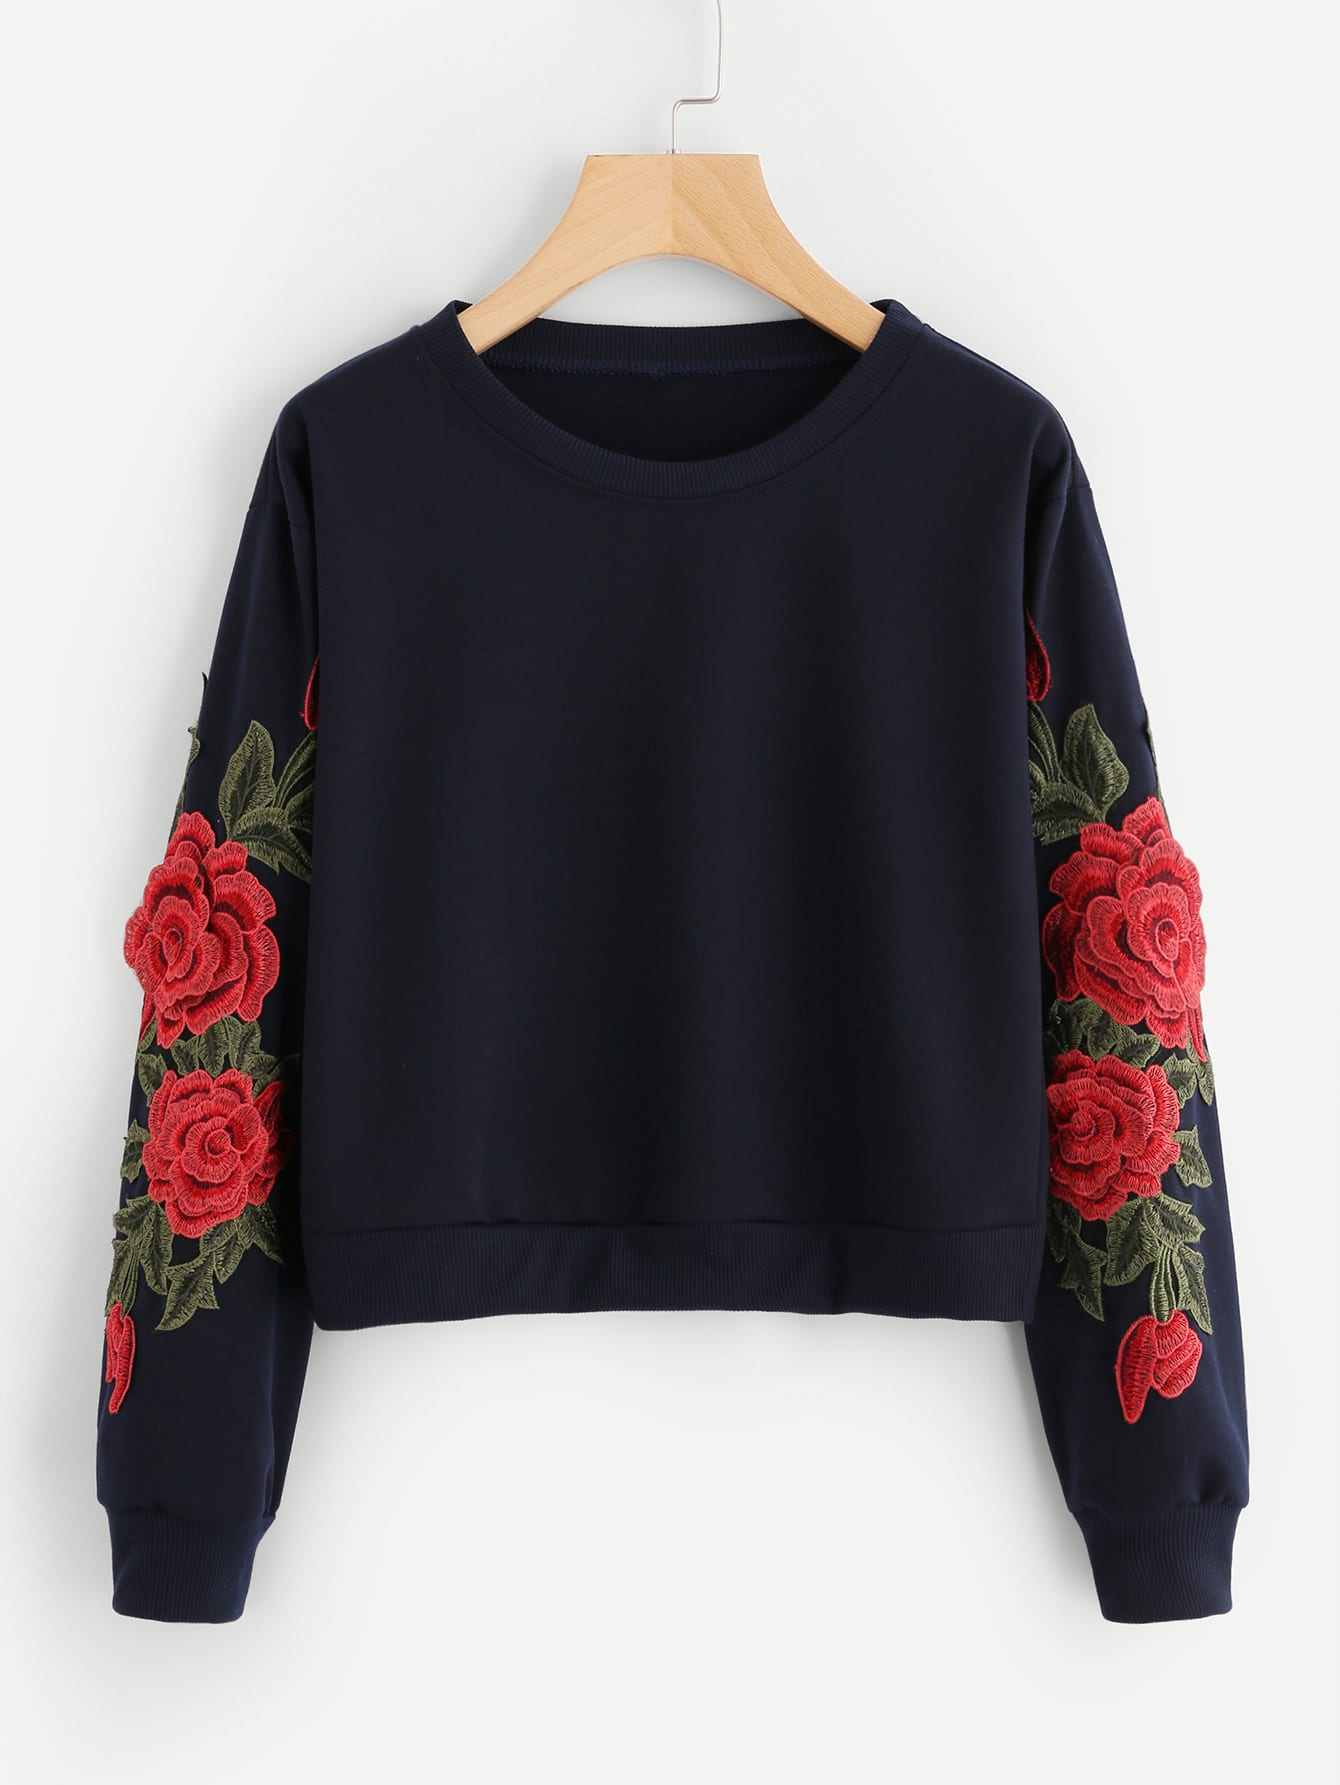 Rose Embroidered Applique Sleeve Sweatshirt embroidered rose applique side split belt dress